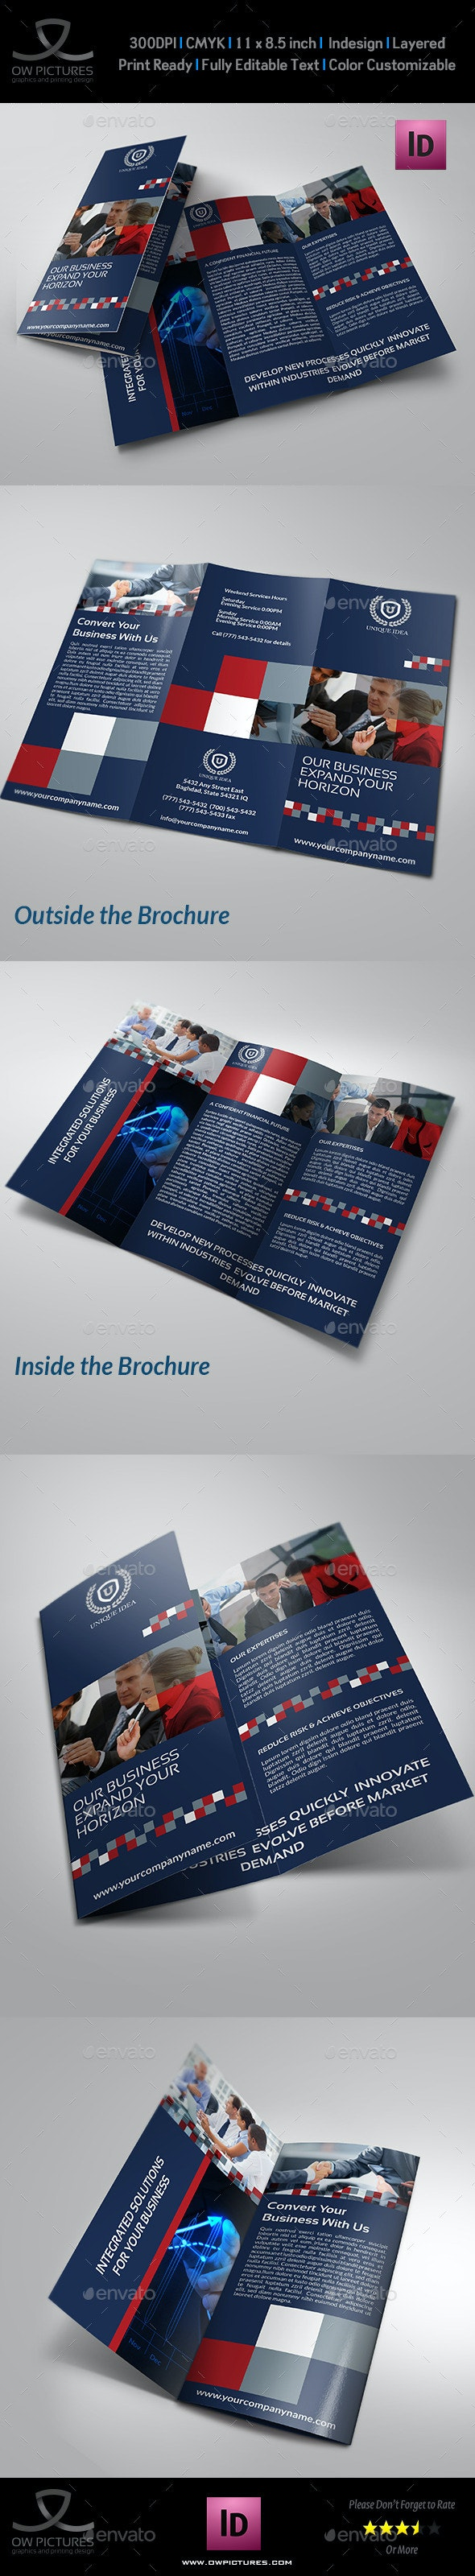 Company Brochure Tri-Fold Brochure Vol.12 - Corporate Brochures